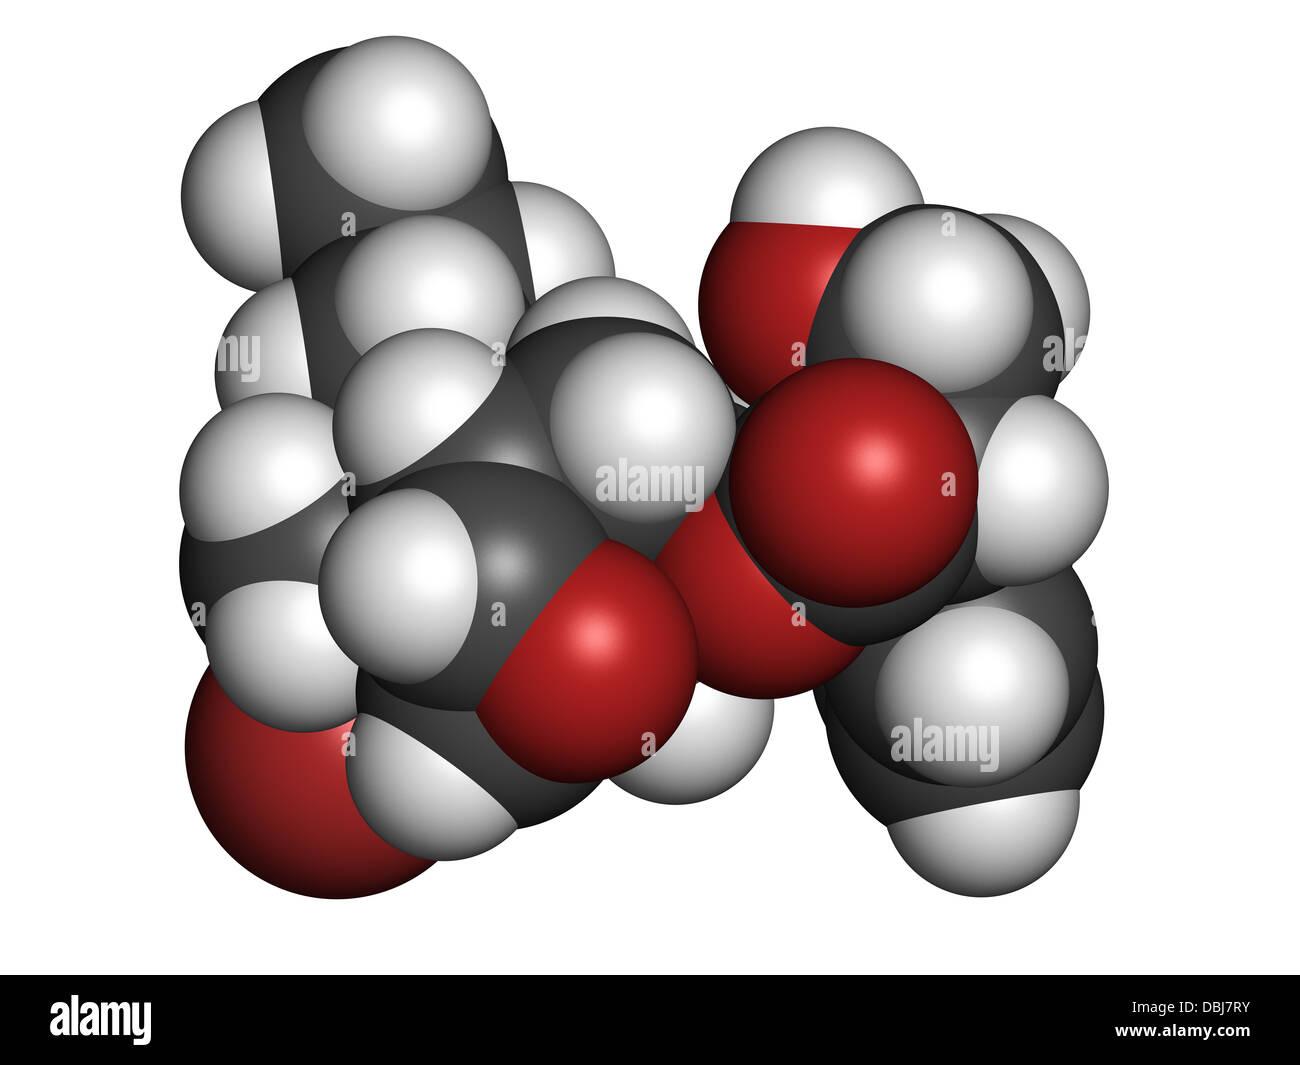 Molekuul be Stock Photos & Images, Molekuul be Stock